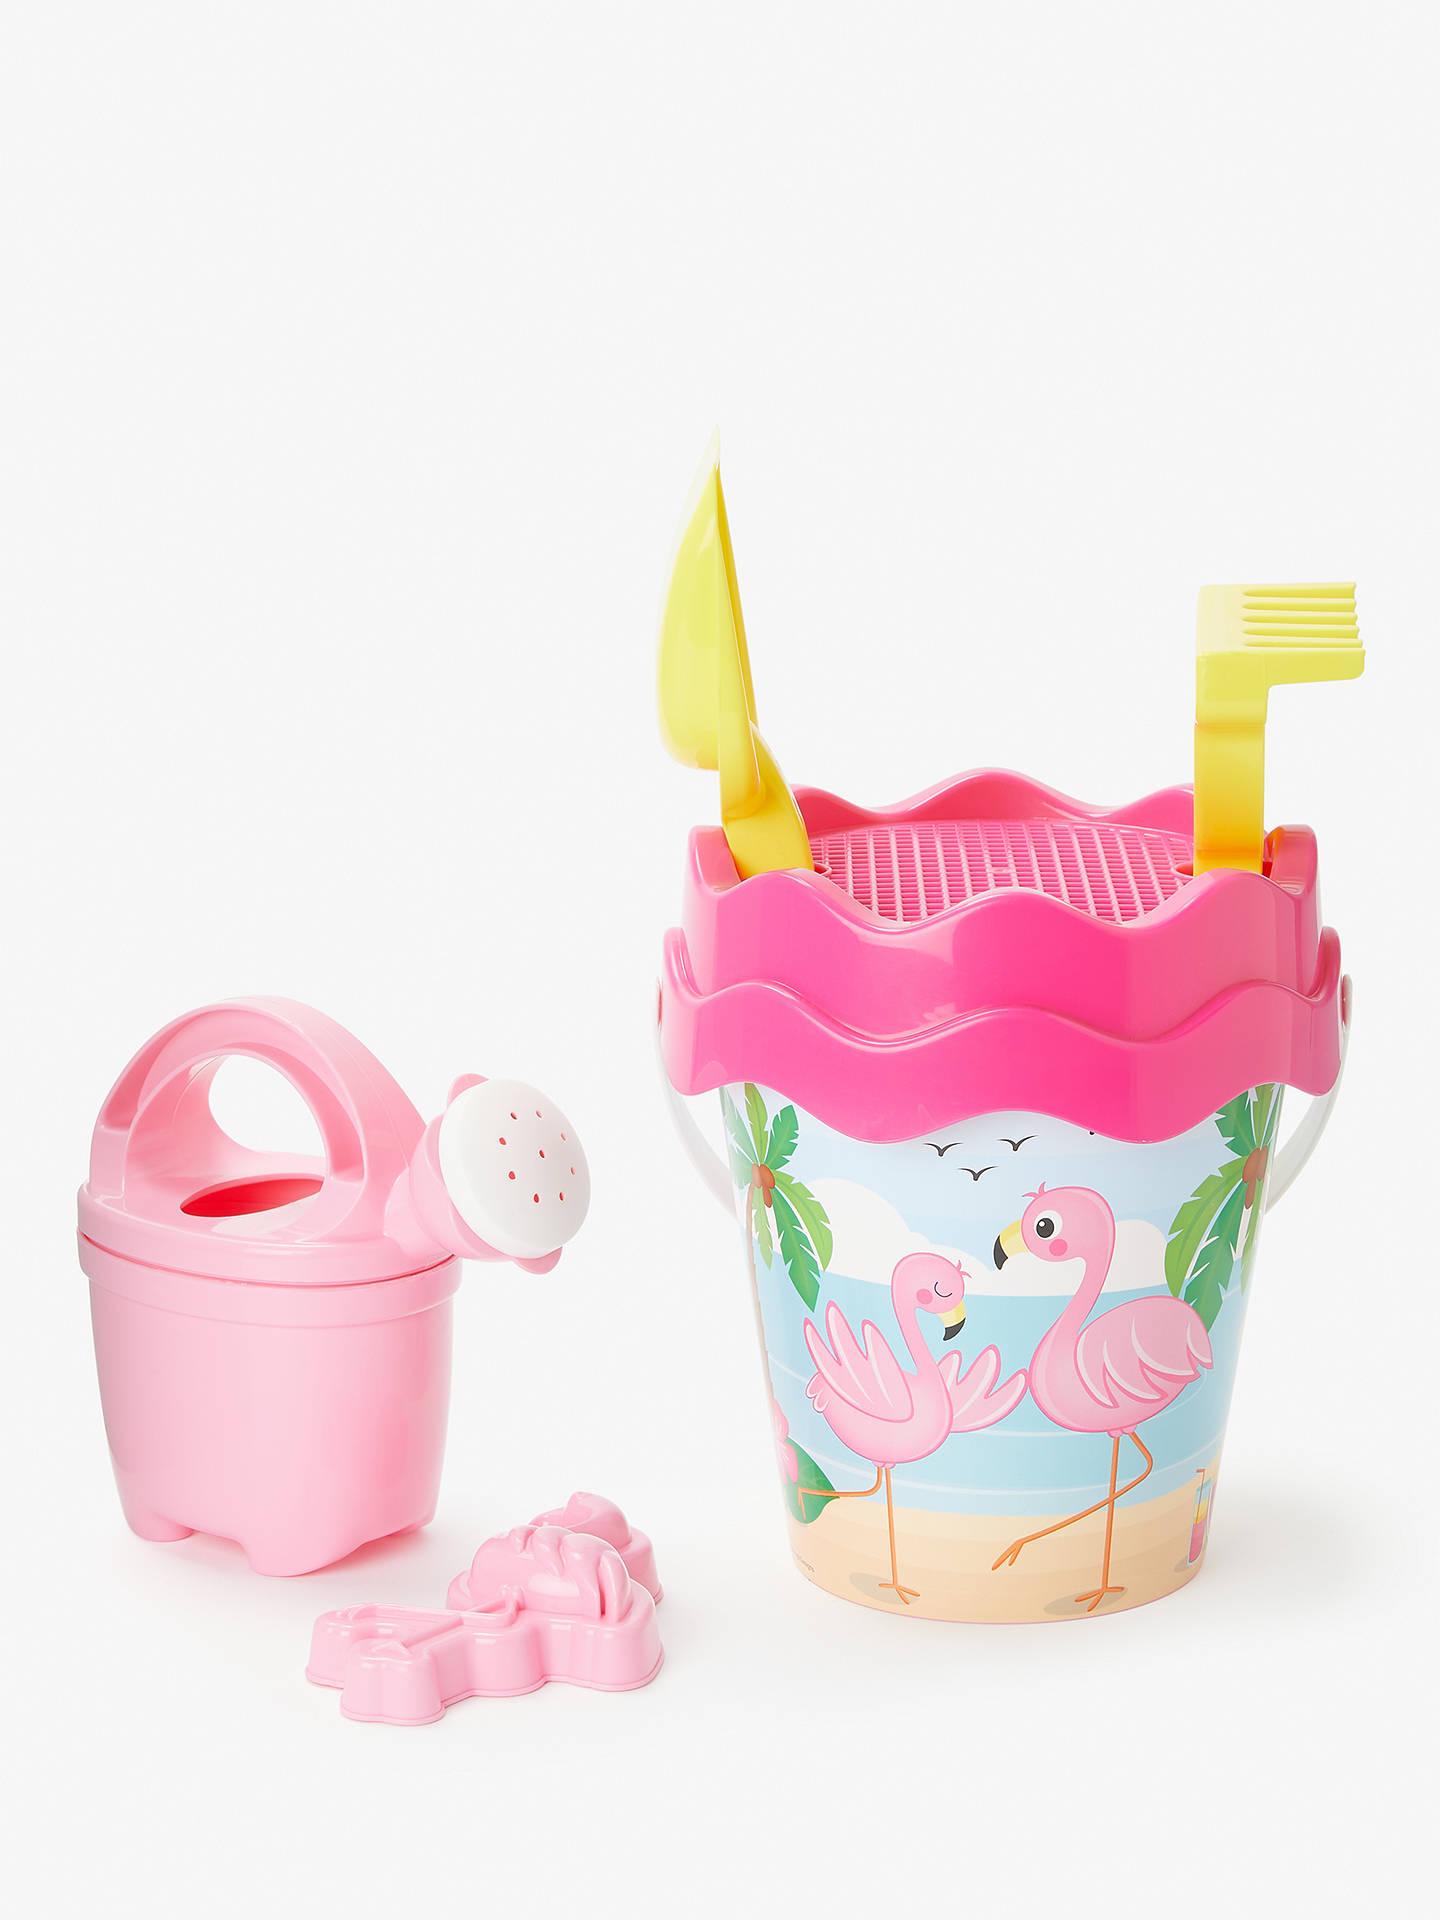 0a131c6b51a1 ... Buy John Lewis & Partners Flamingo Bucket and Spade Set Online at  johnlewis.com